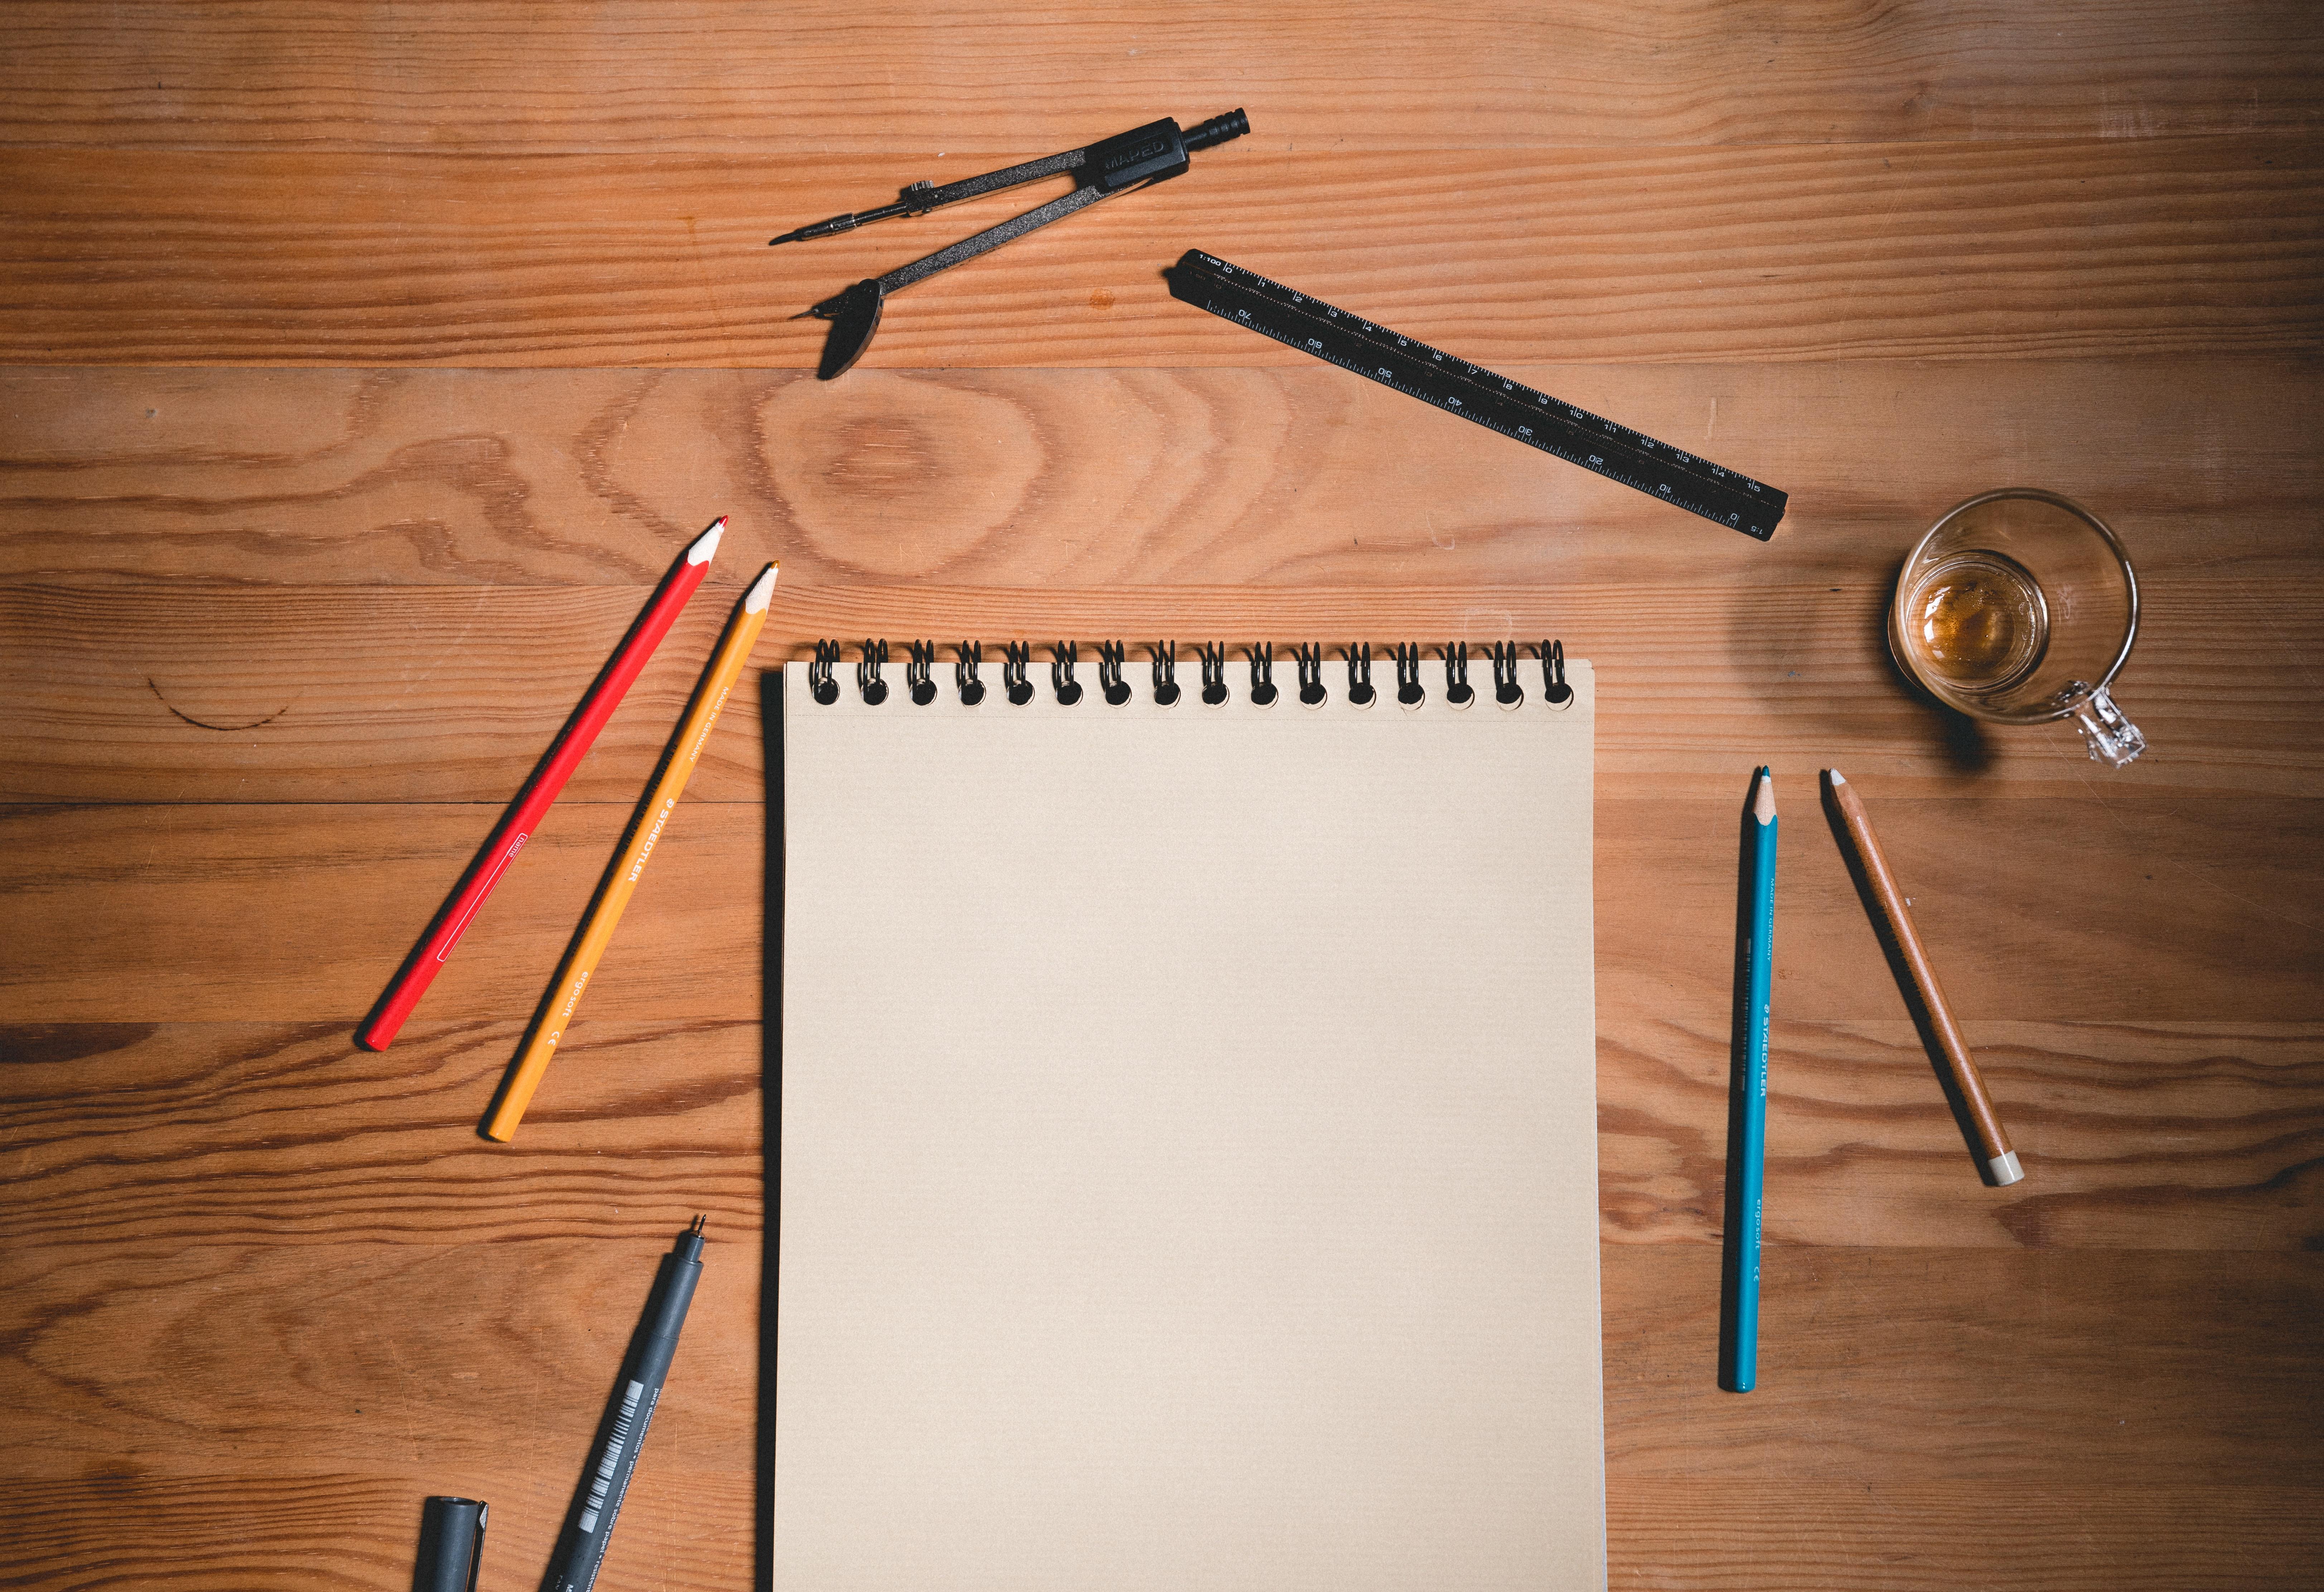 Drawing学习新技能